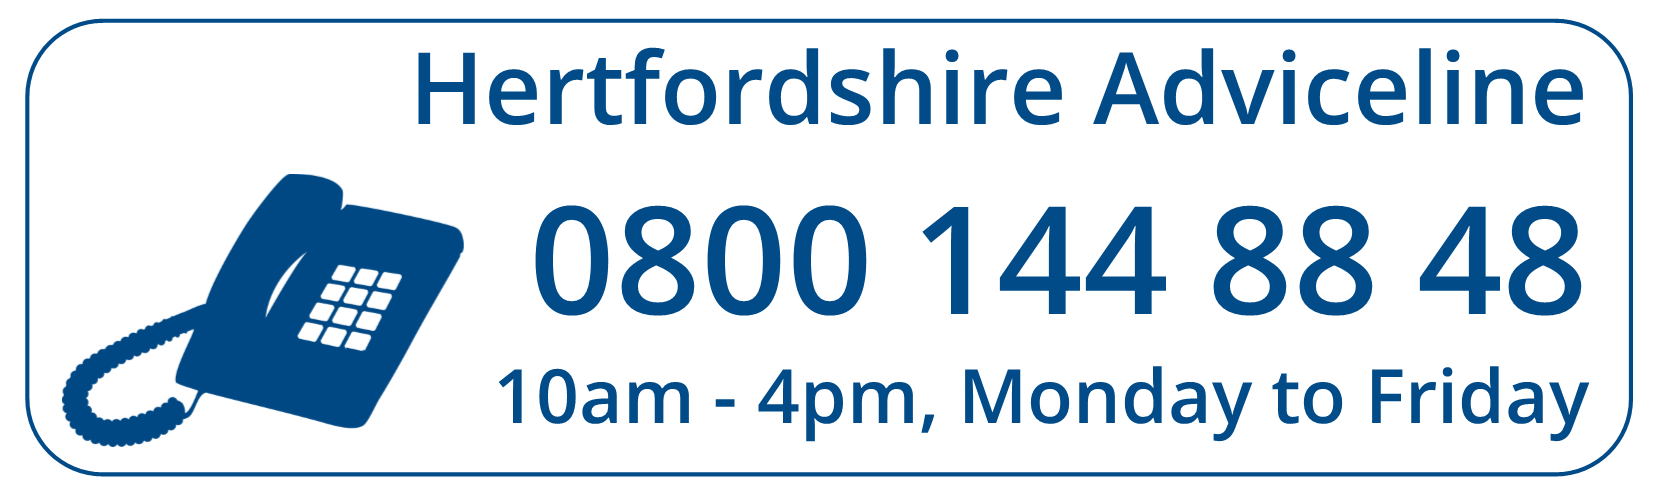 Hertfordshire Adviceline Service - 0800 144 88 48